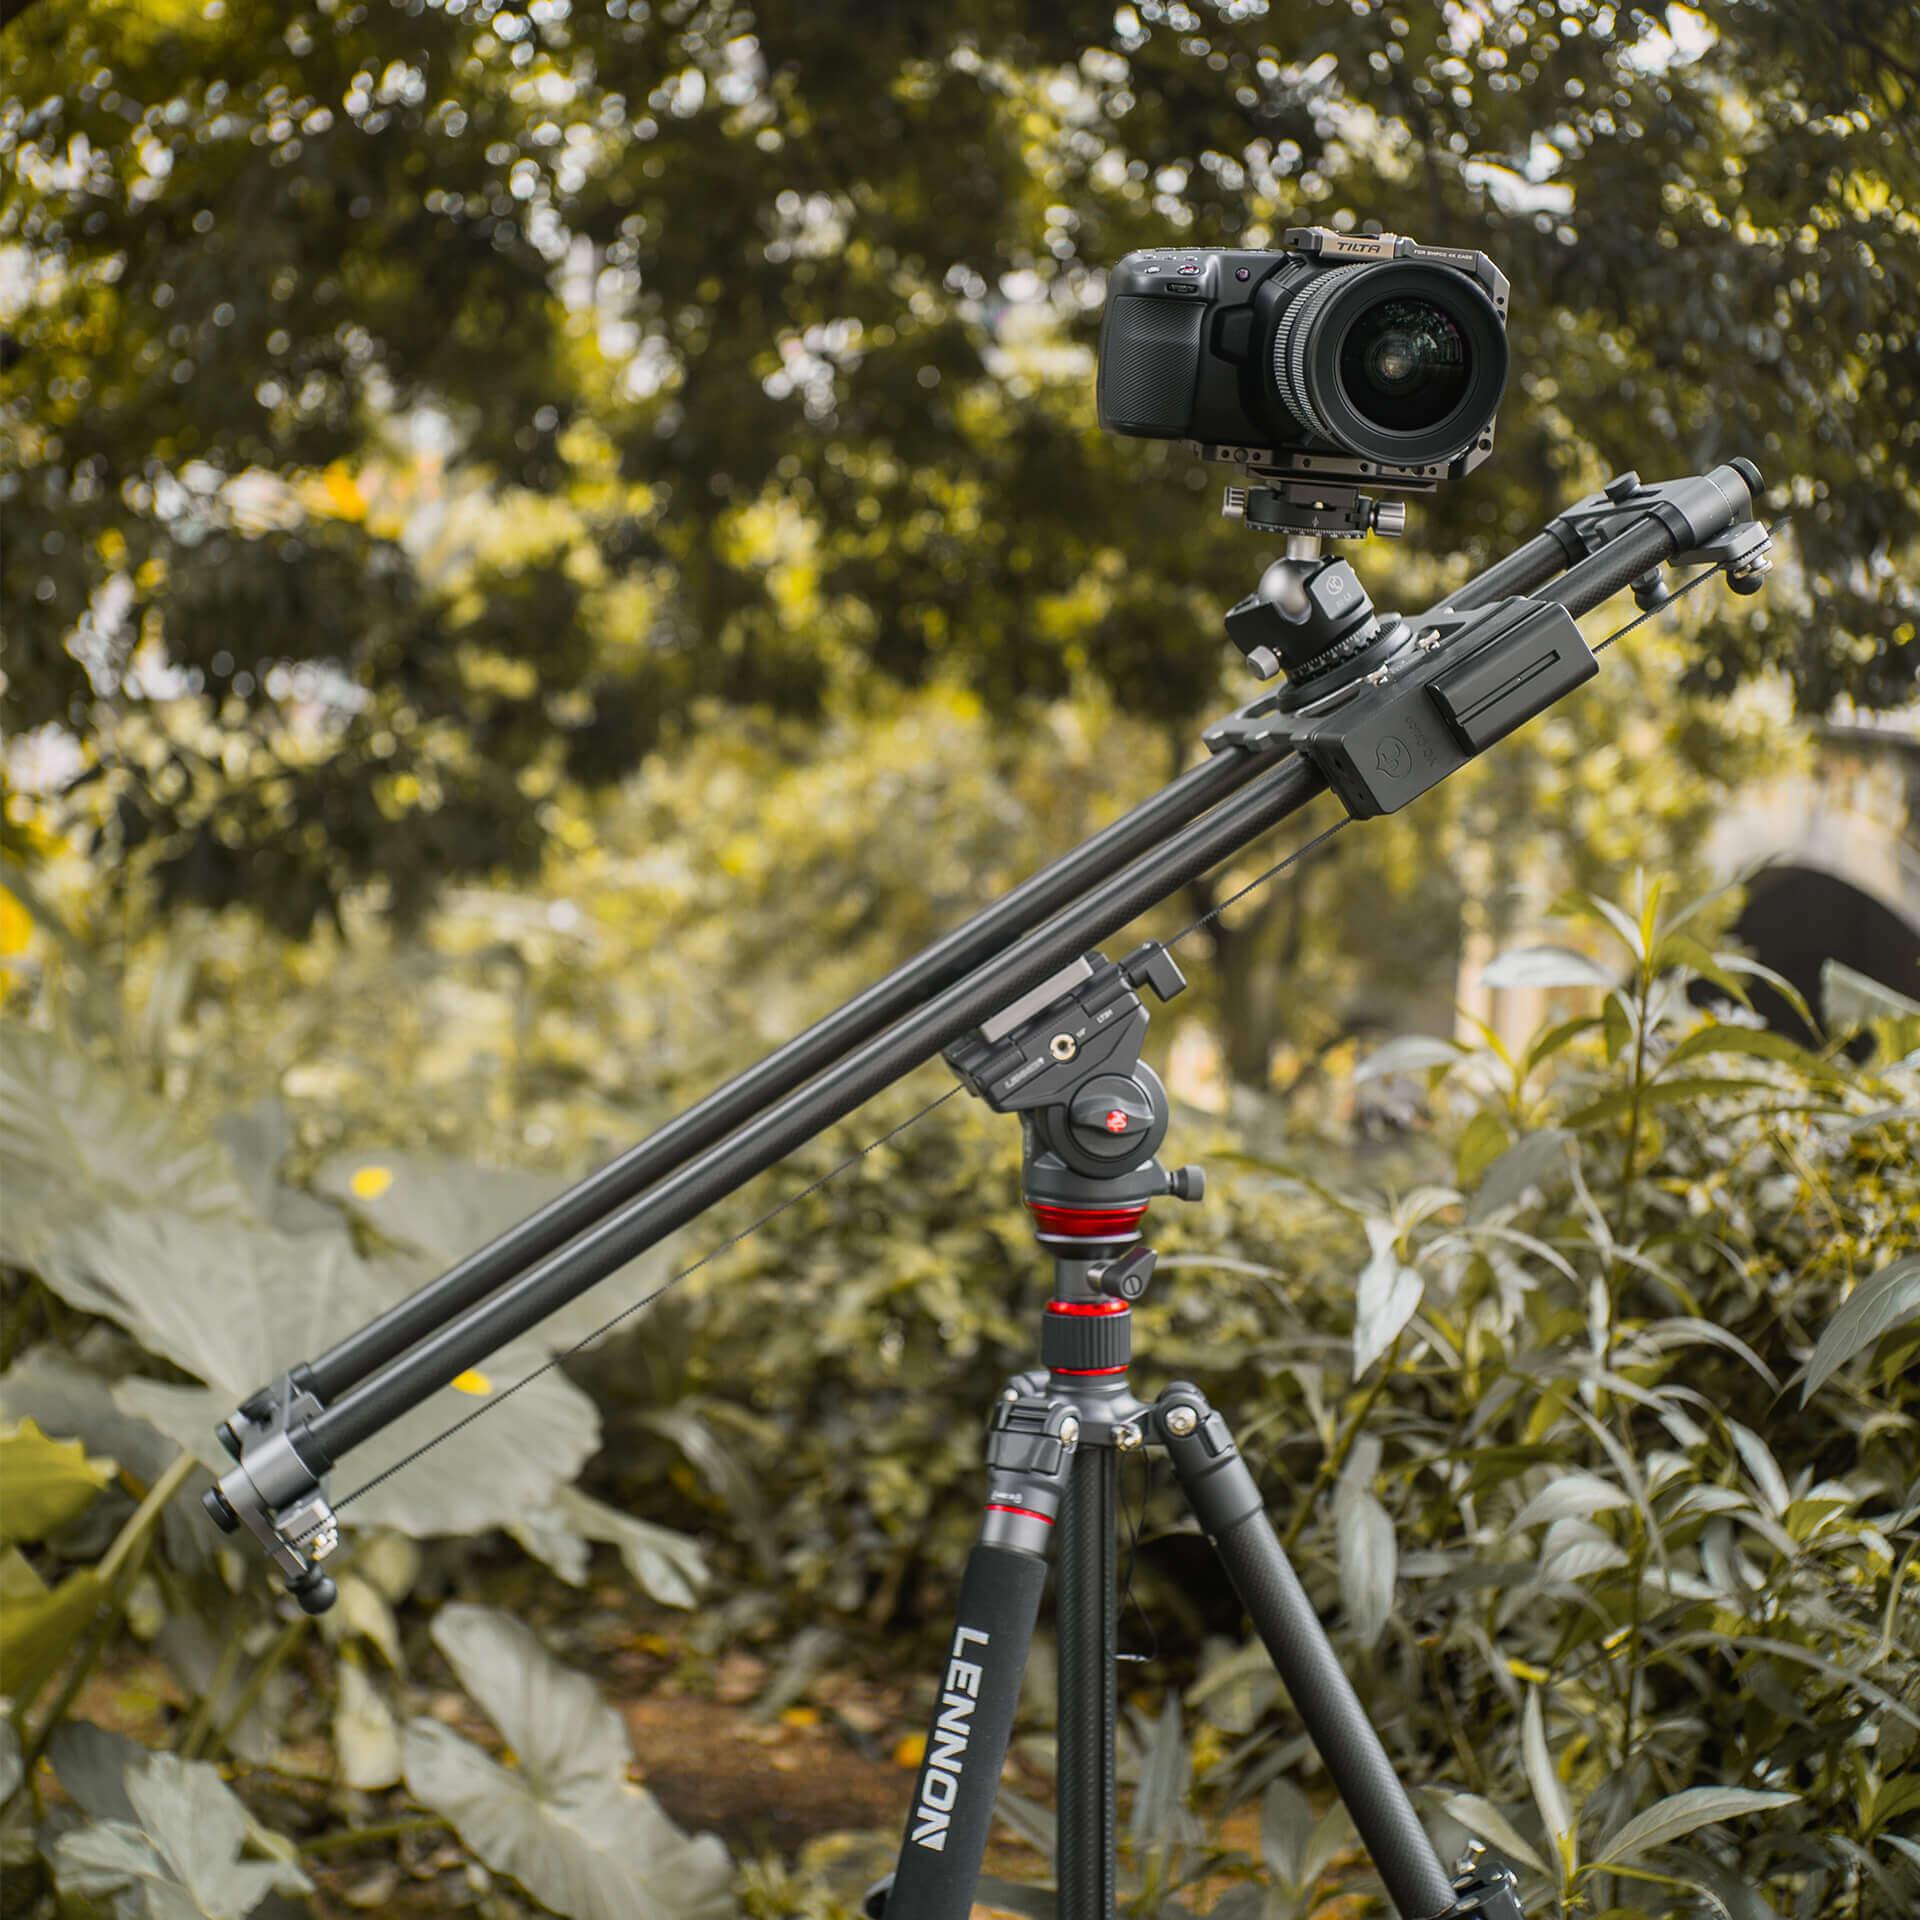 YC Onion HDM120 HOT DOG 120cm prlx Pan Slider with App 9